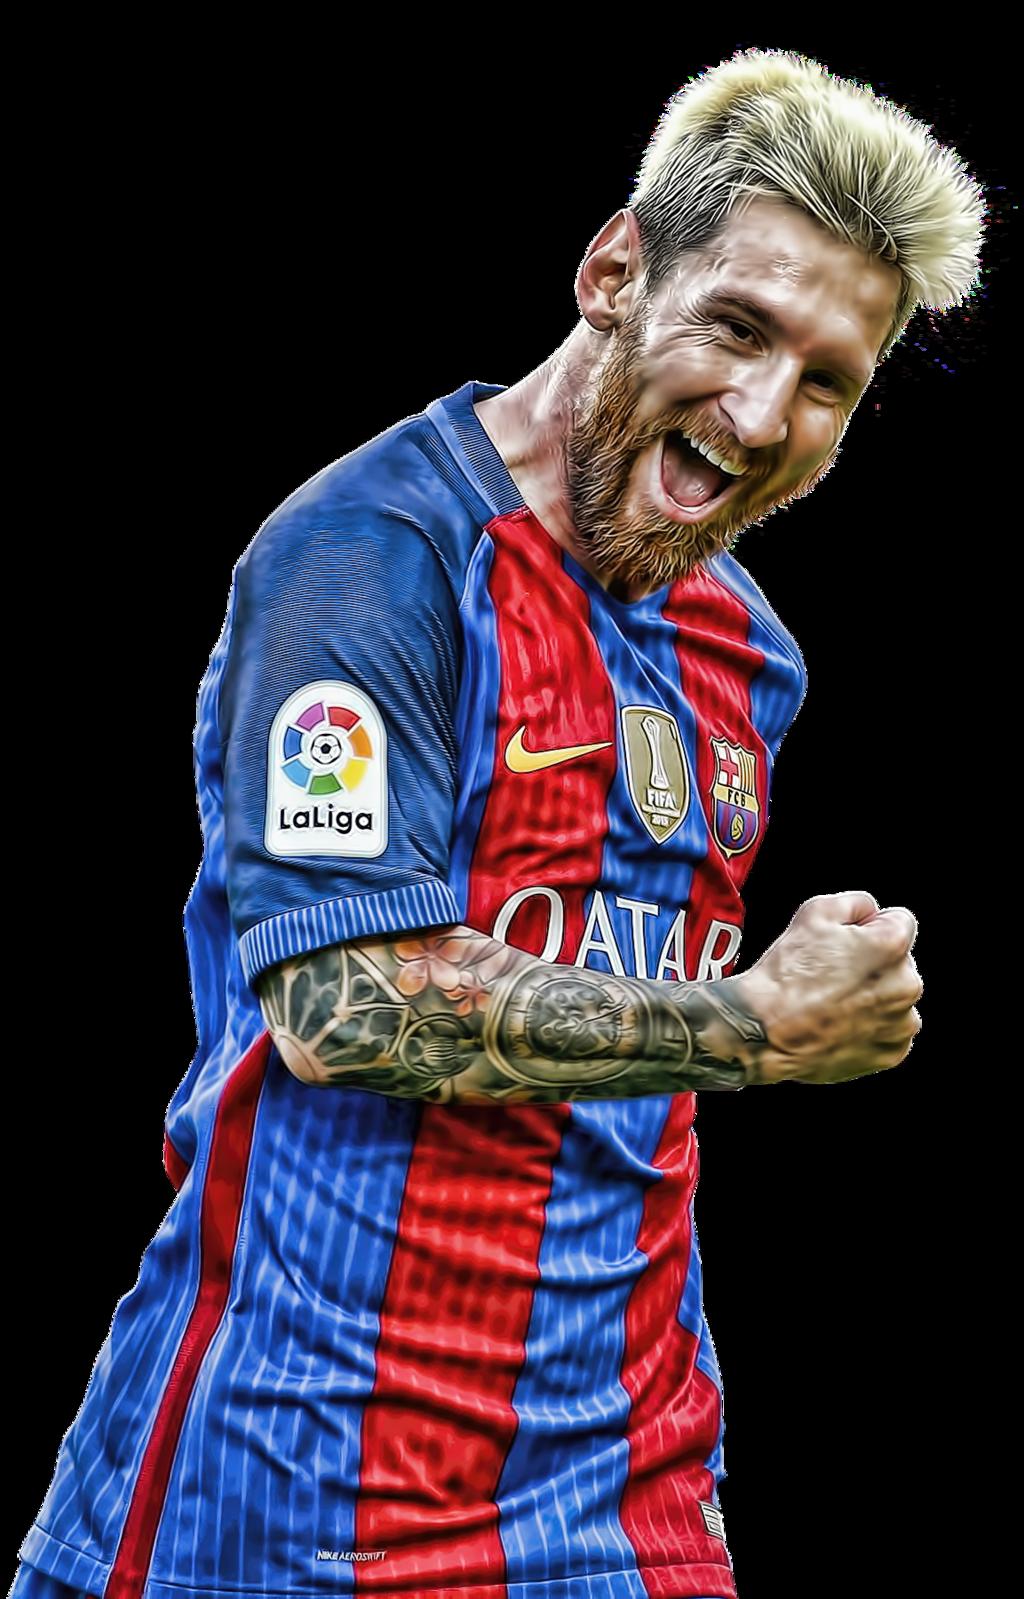 Lionel messi clipart 2018 clip art transparent download Lionel Messi Png Happy Smile Fc Barca Clipart Clipart Images ... clip art transparent download